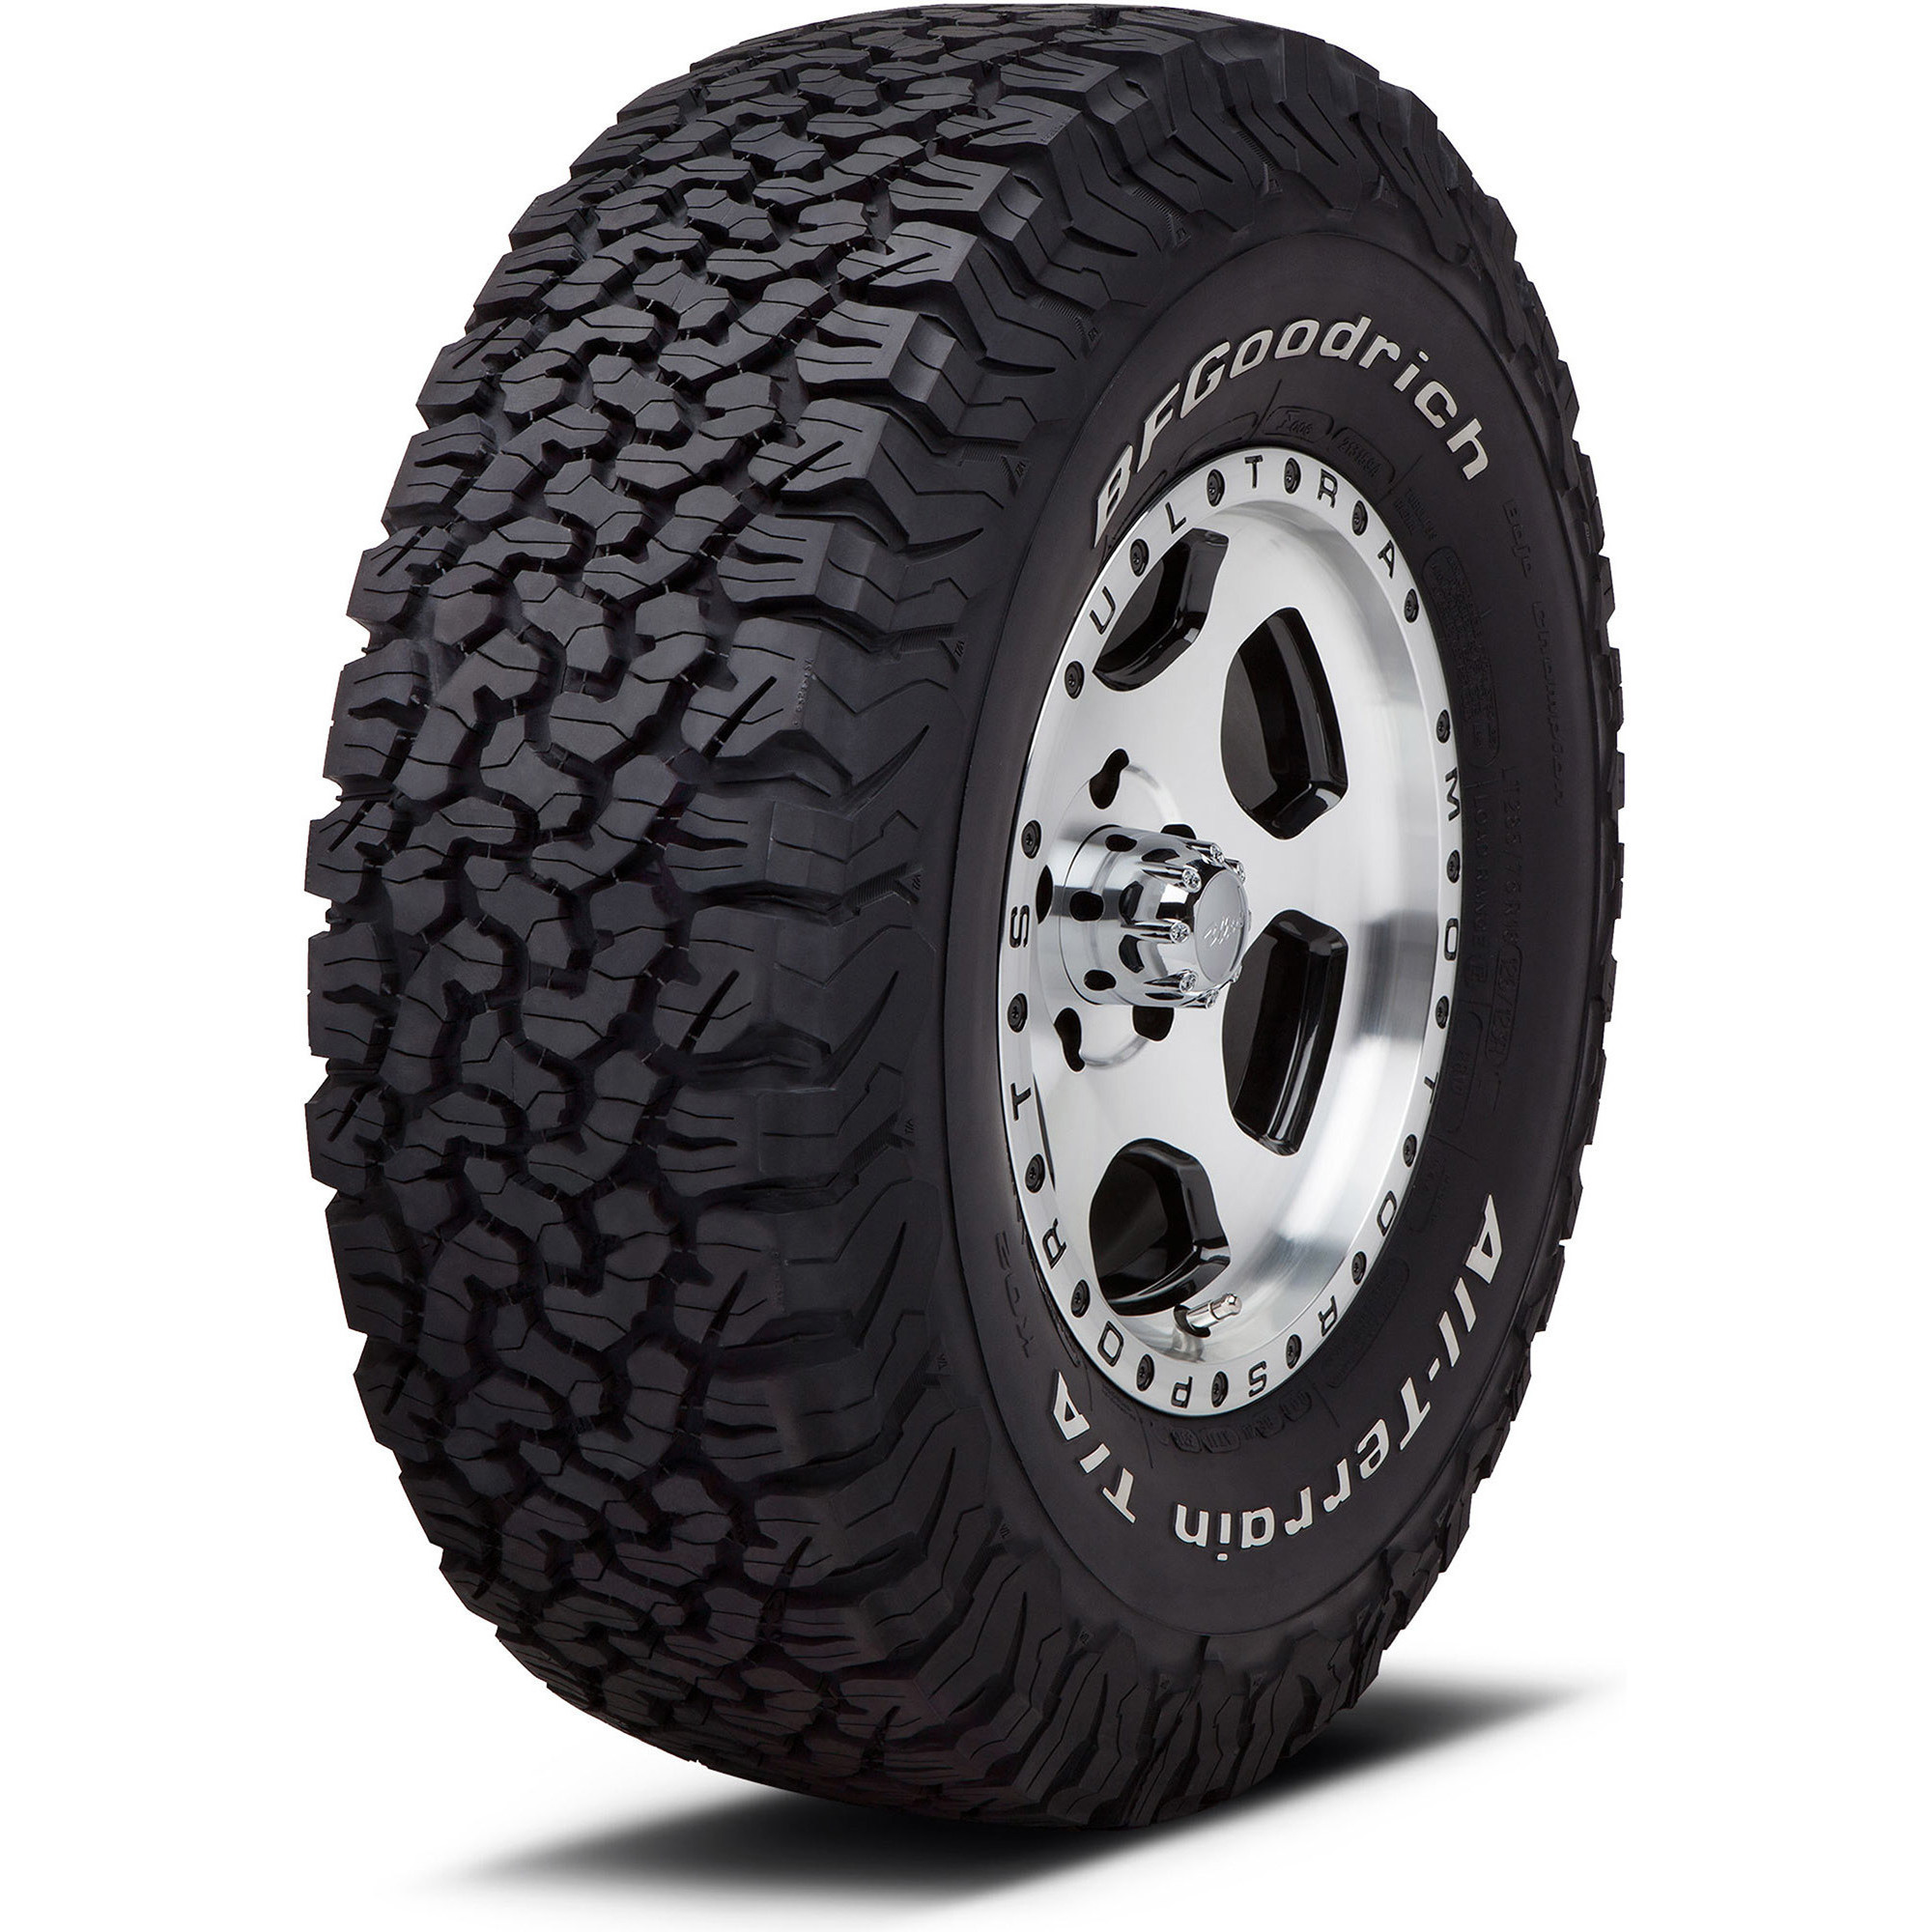 All Terrain Tires Vs Mud Terrain Tires Tirebuyer Com Tirebuyer Com